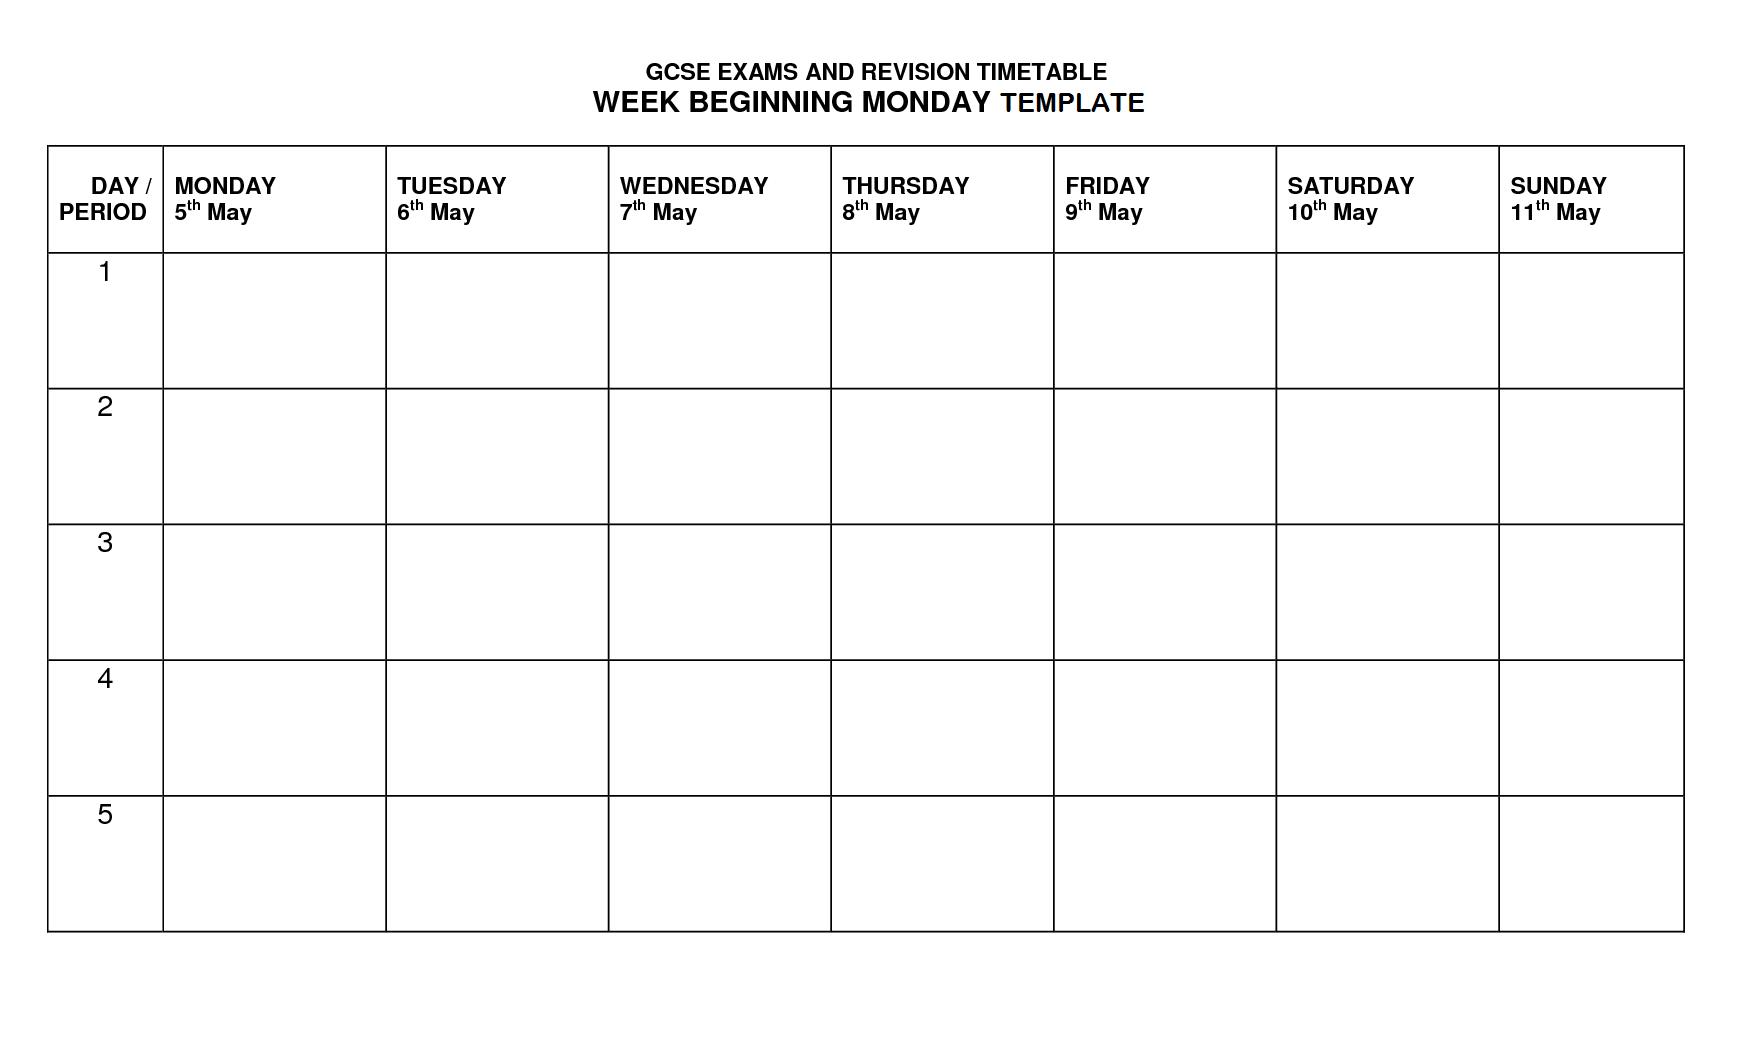 Timetable Template  Timetable Templates  Timetable Template Inside Blank Revision Timetable Template